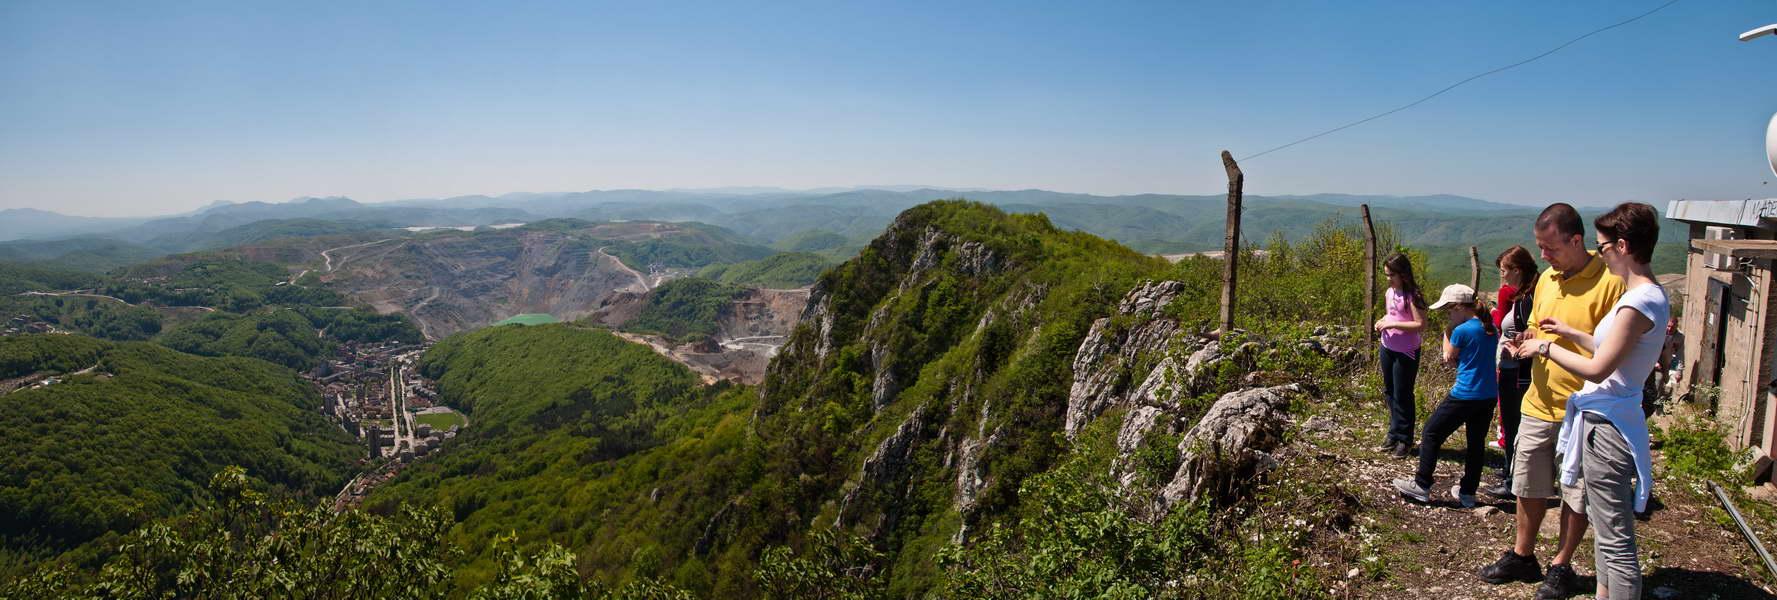 Pogled sa Starice na Majdanpek i rudnik